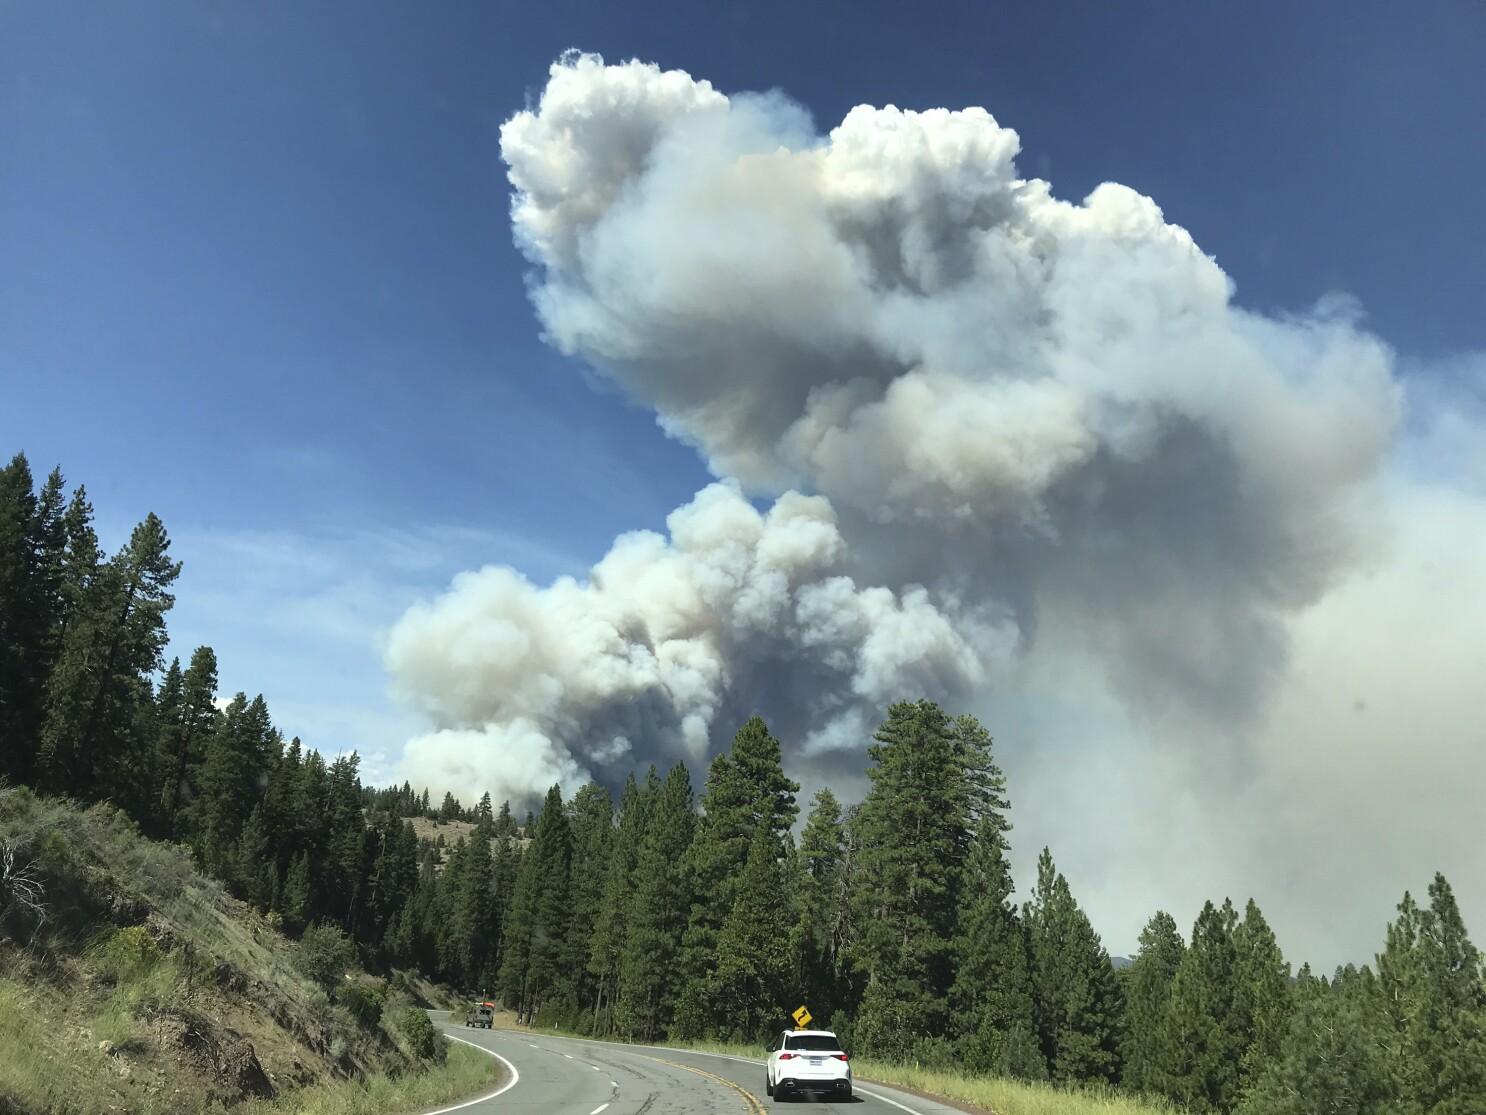 Firefighters battle twin blazes in northeastern California forests ...